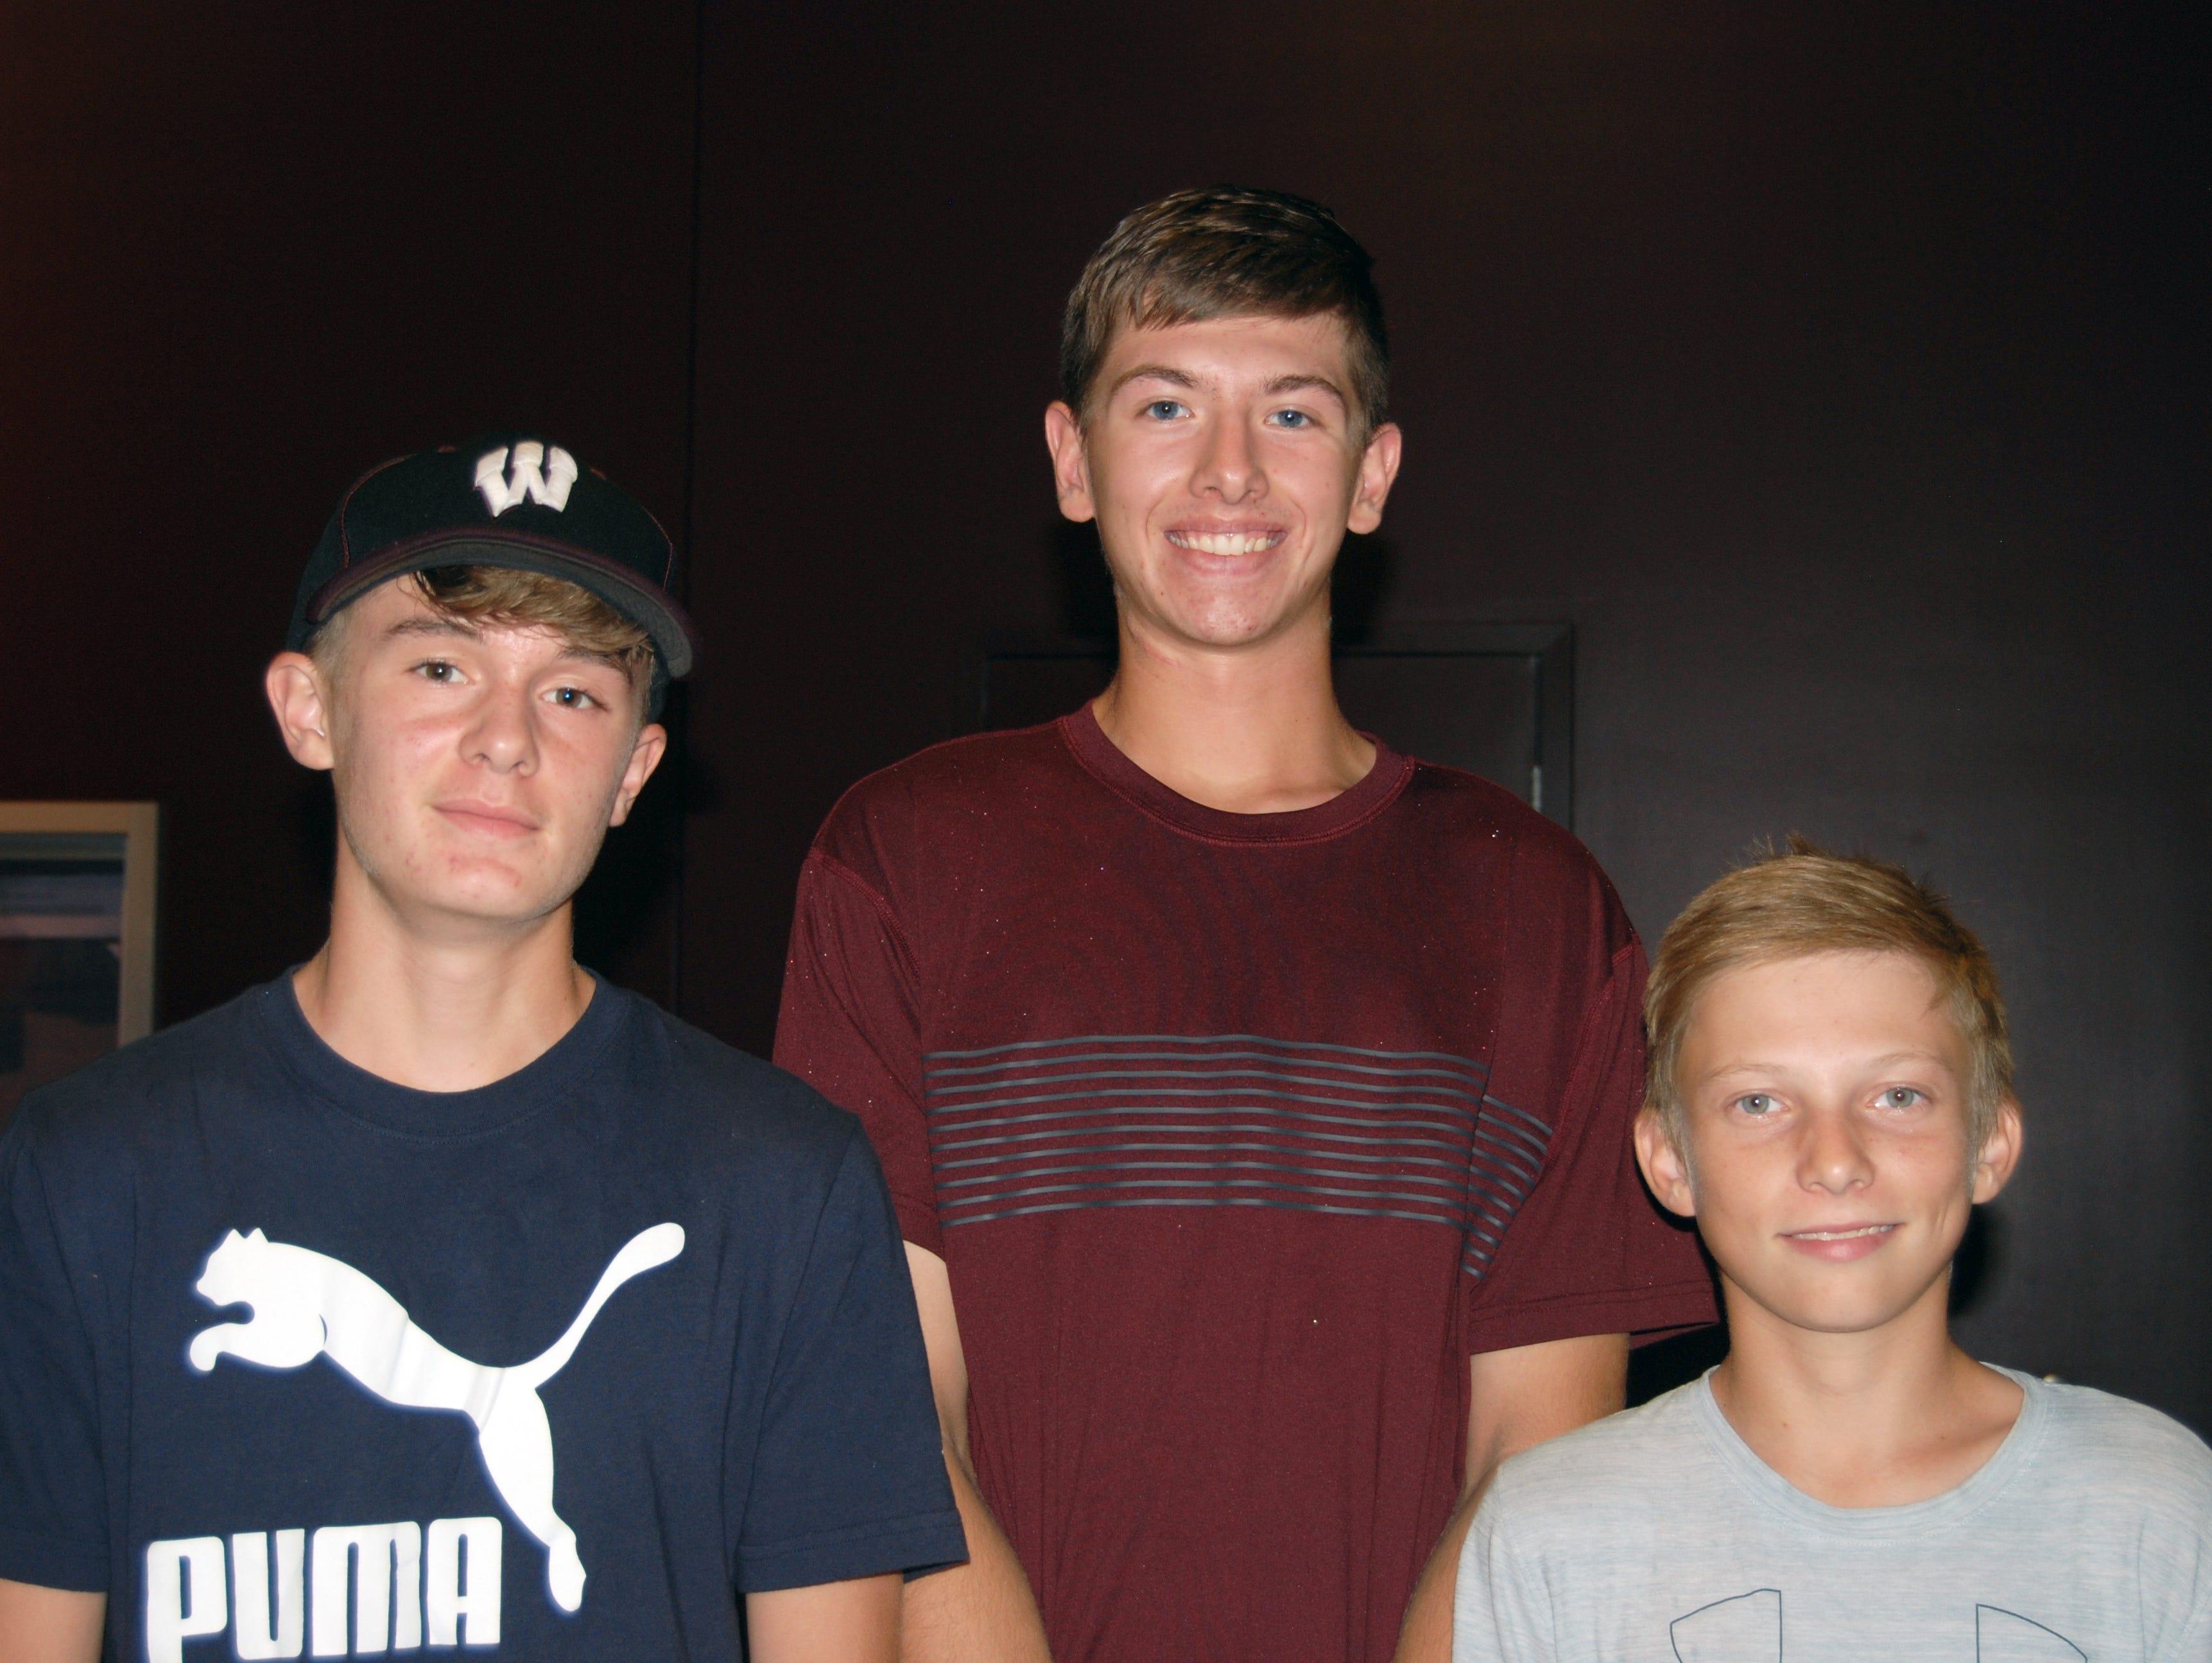 Chandler Welch, Ethan Foster and Brandon Packham